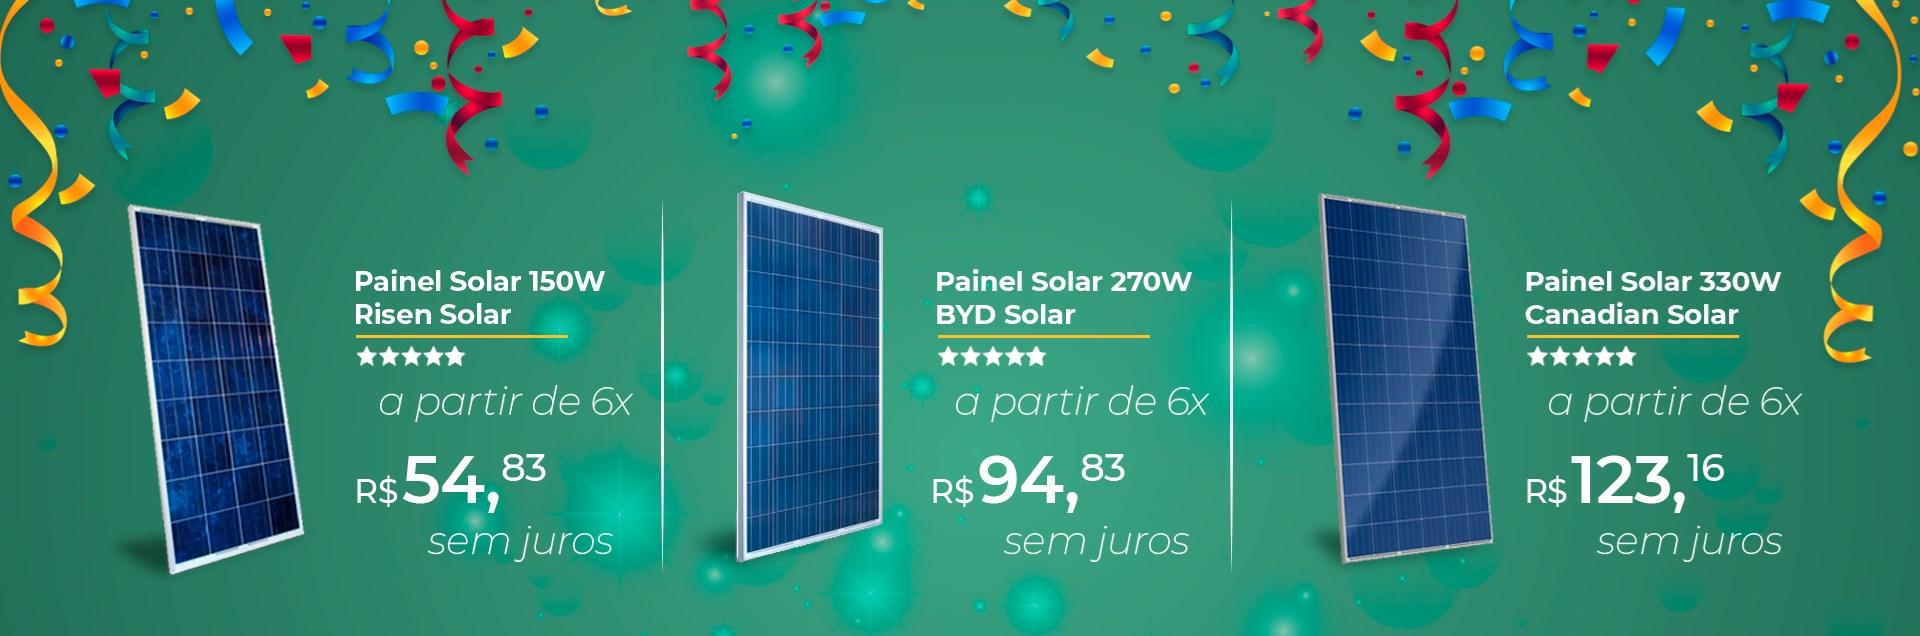 Carnaval 2019 - Painéis Solares